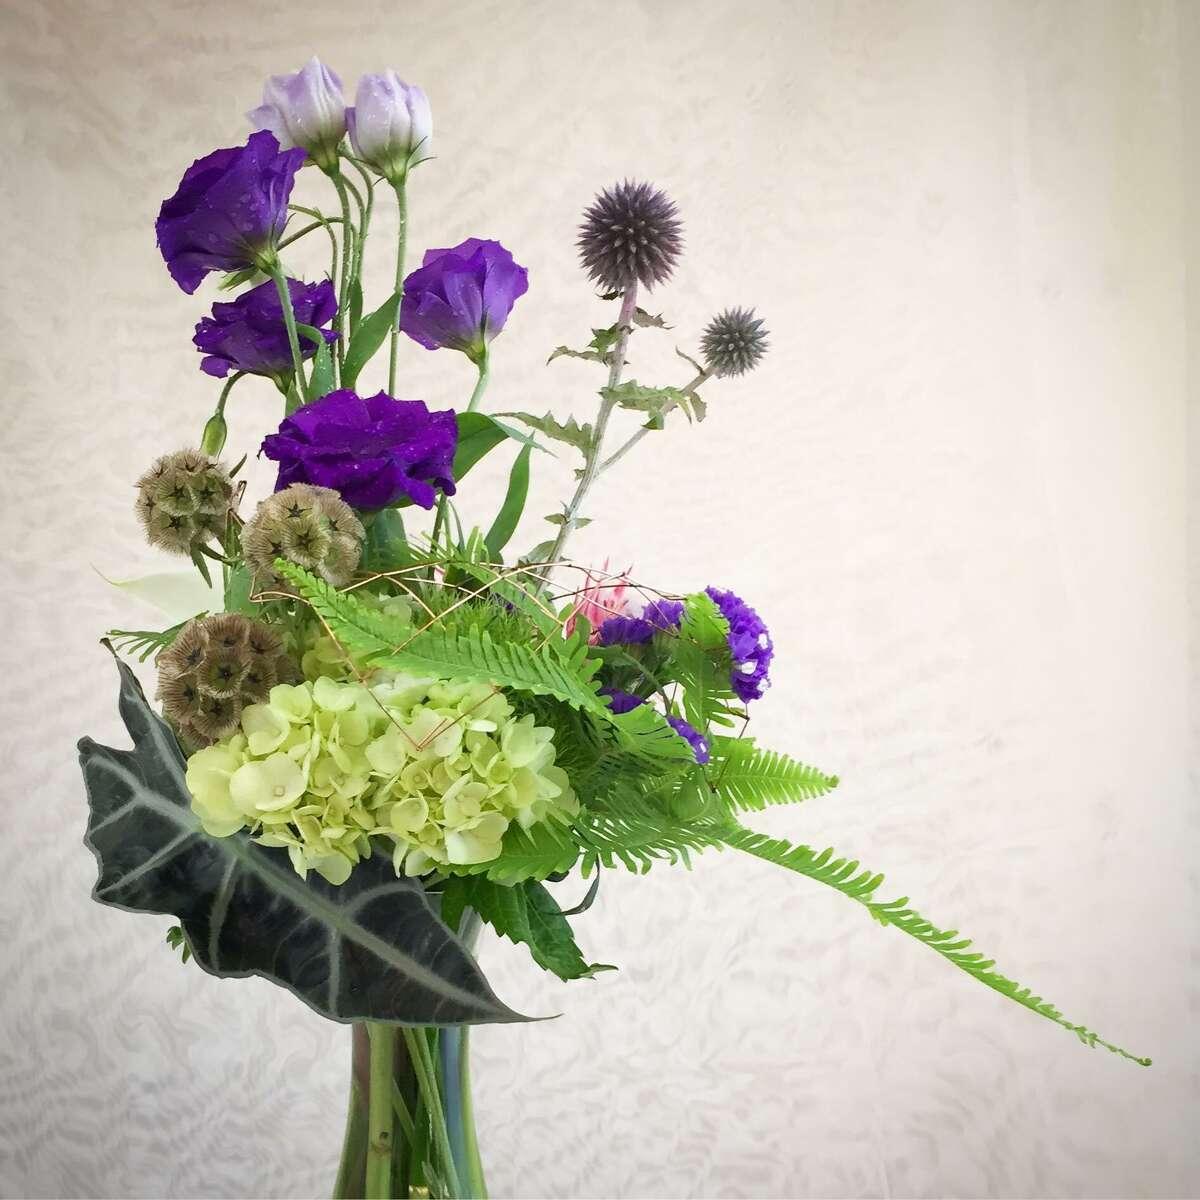 Green Dahlia Florist owner Catherine Epright's design